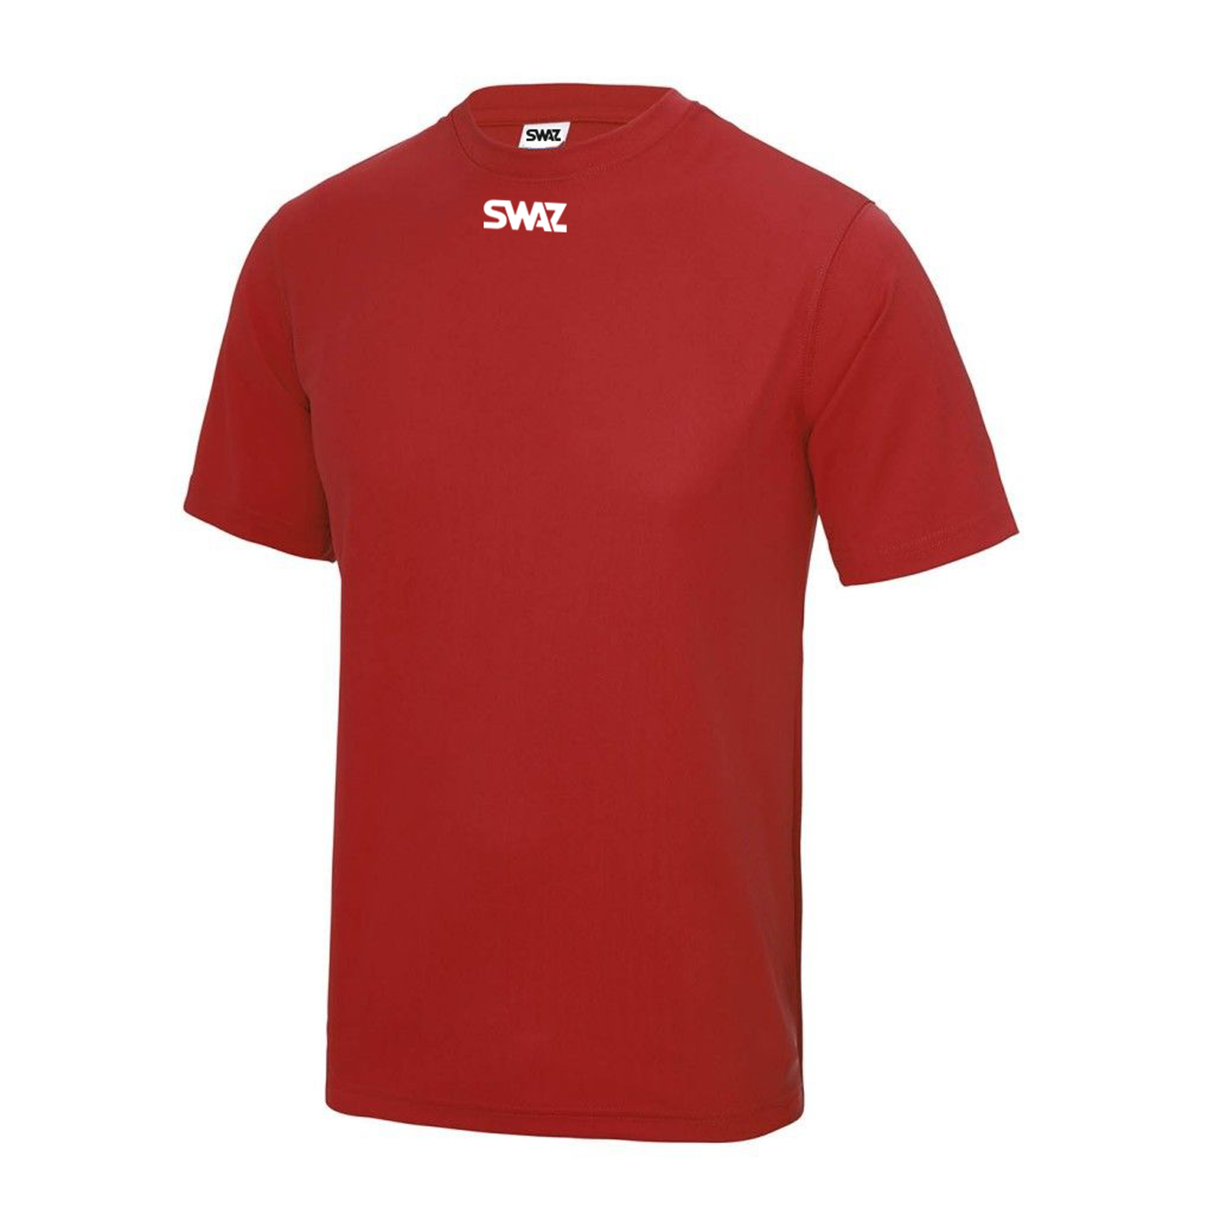 SWAZ Club Training T-Shirt – Red